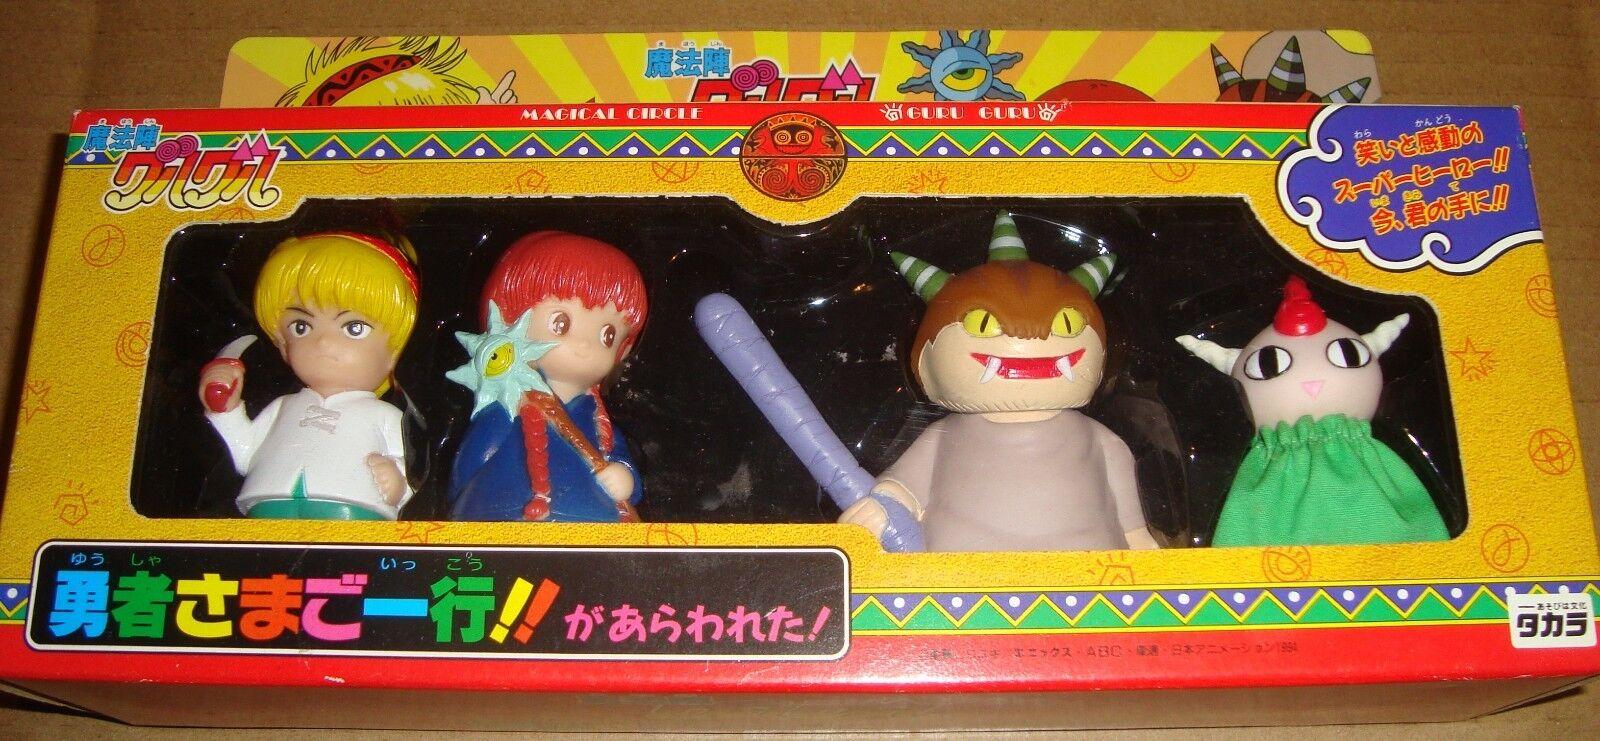 MAGICAL CIRCLE GURU GURU SET 4 MINI FIGURE TAKARA 1994 (IL GIrossoONDO DELLA MAGIA